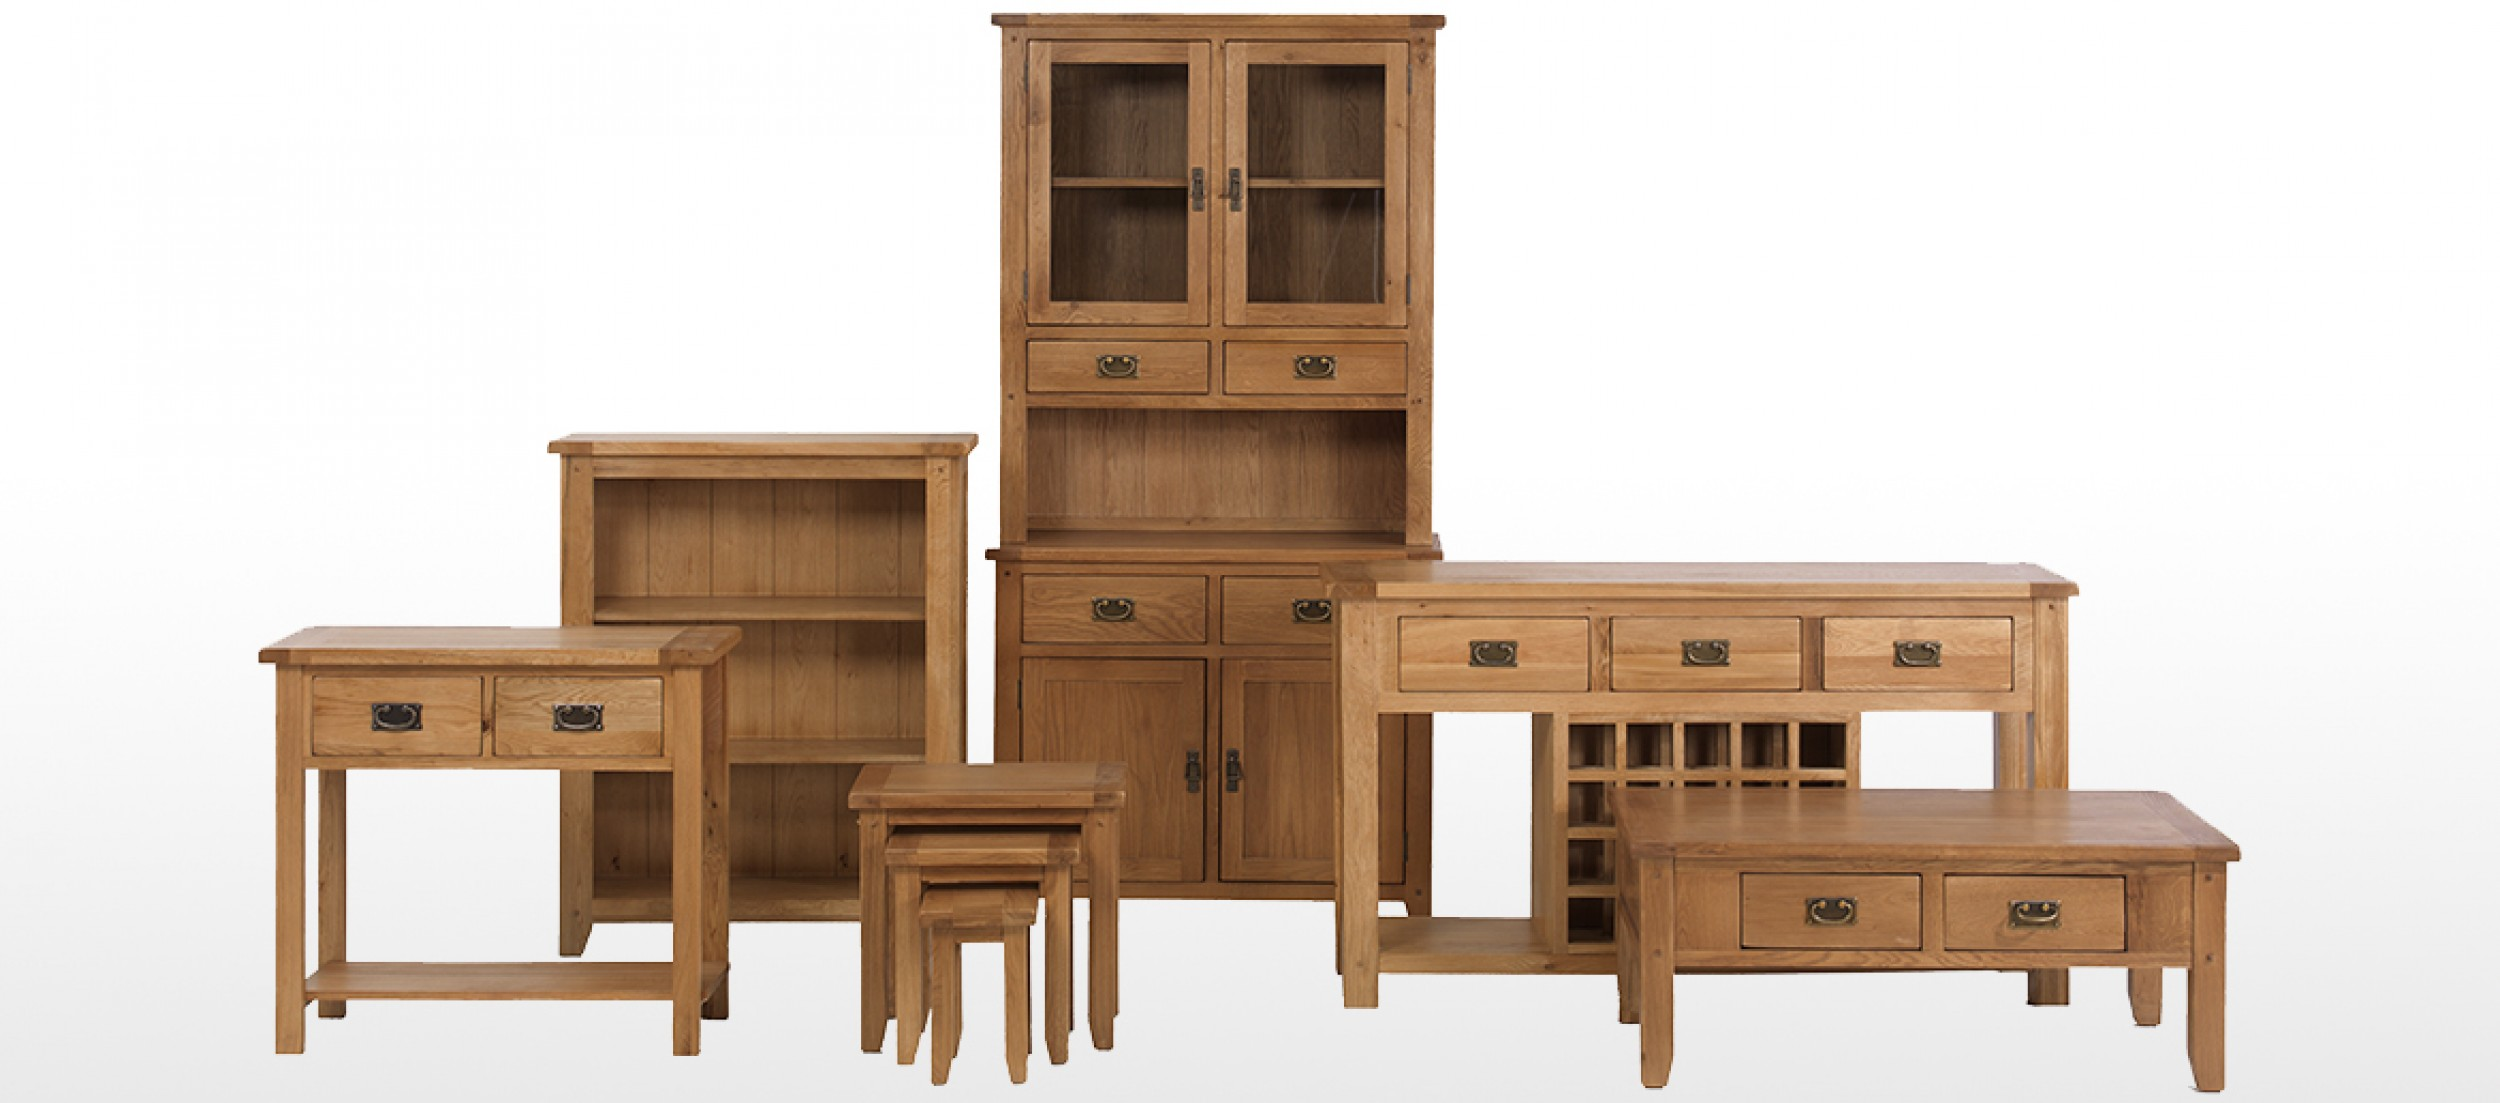 furniture table coco bookcases bookshelves archer republic oak storage bookcase home